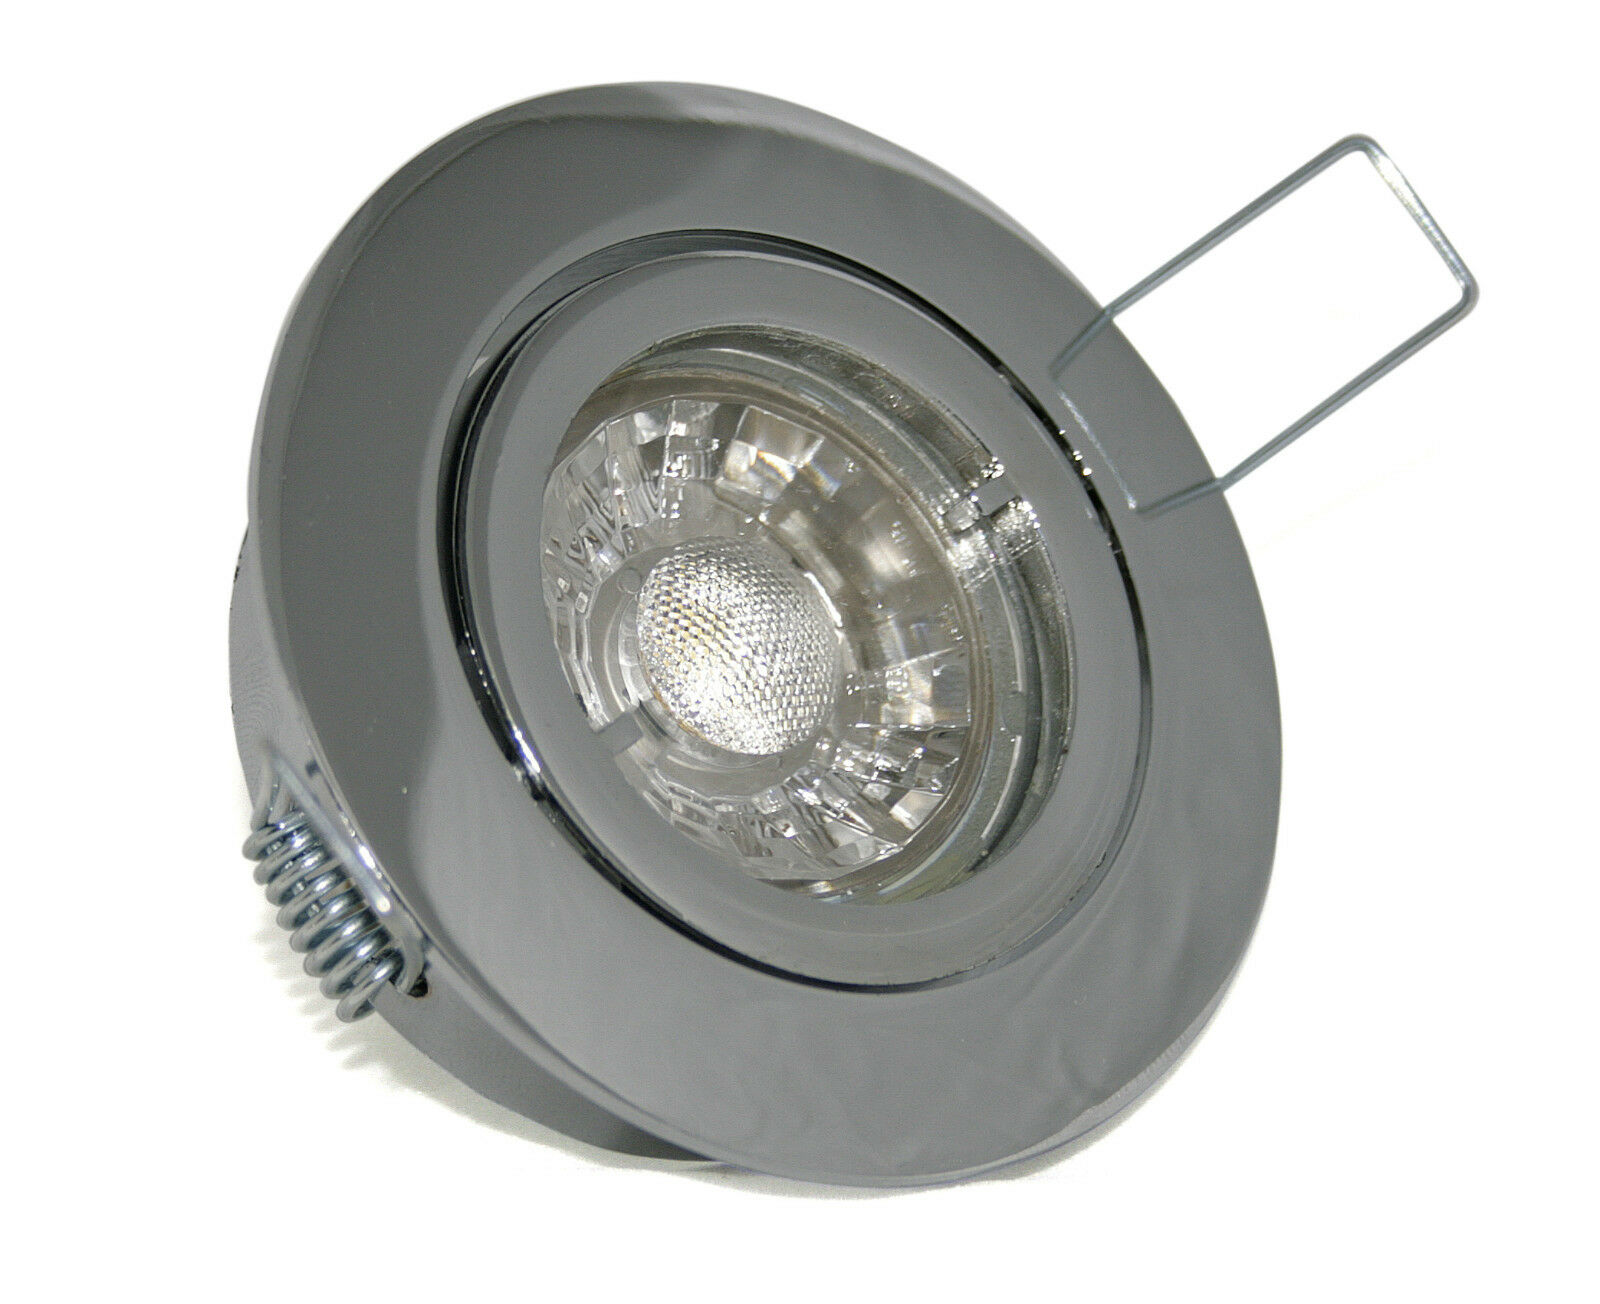 1->10er Sets 7W=70W 7W=70W 7W=70W LED Bad Einbauleuchten Bajo 230Volt Gu10 / IP20 Feuchtraum eedbfd